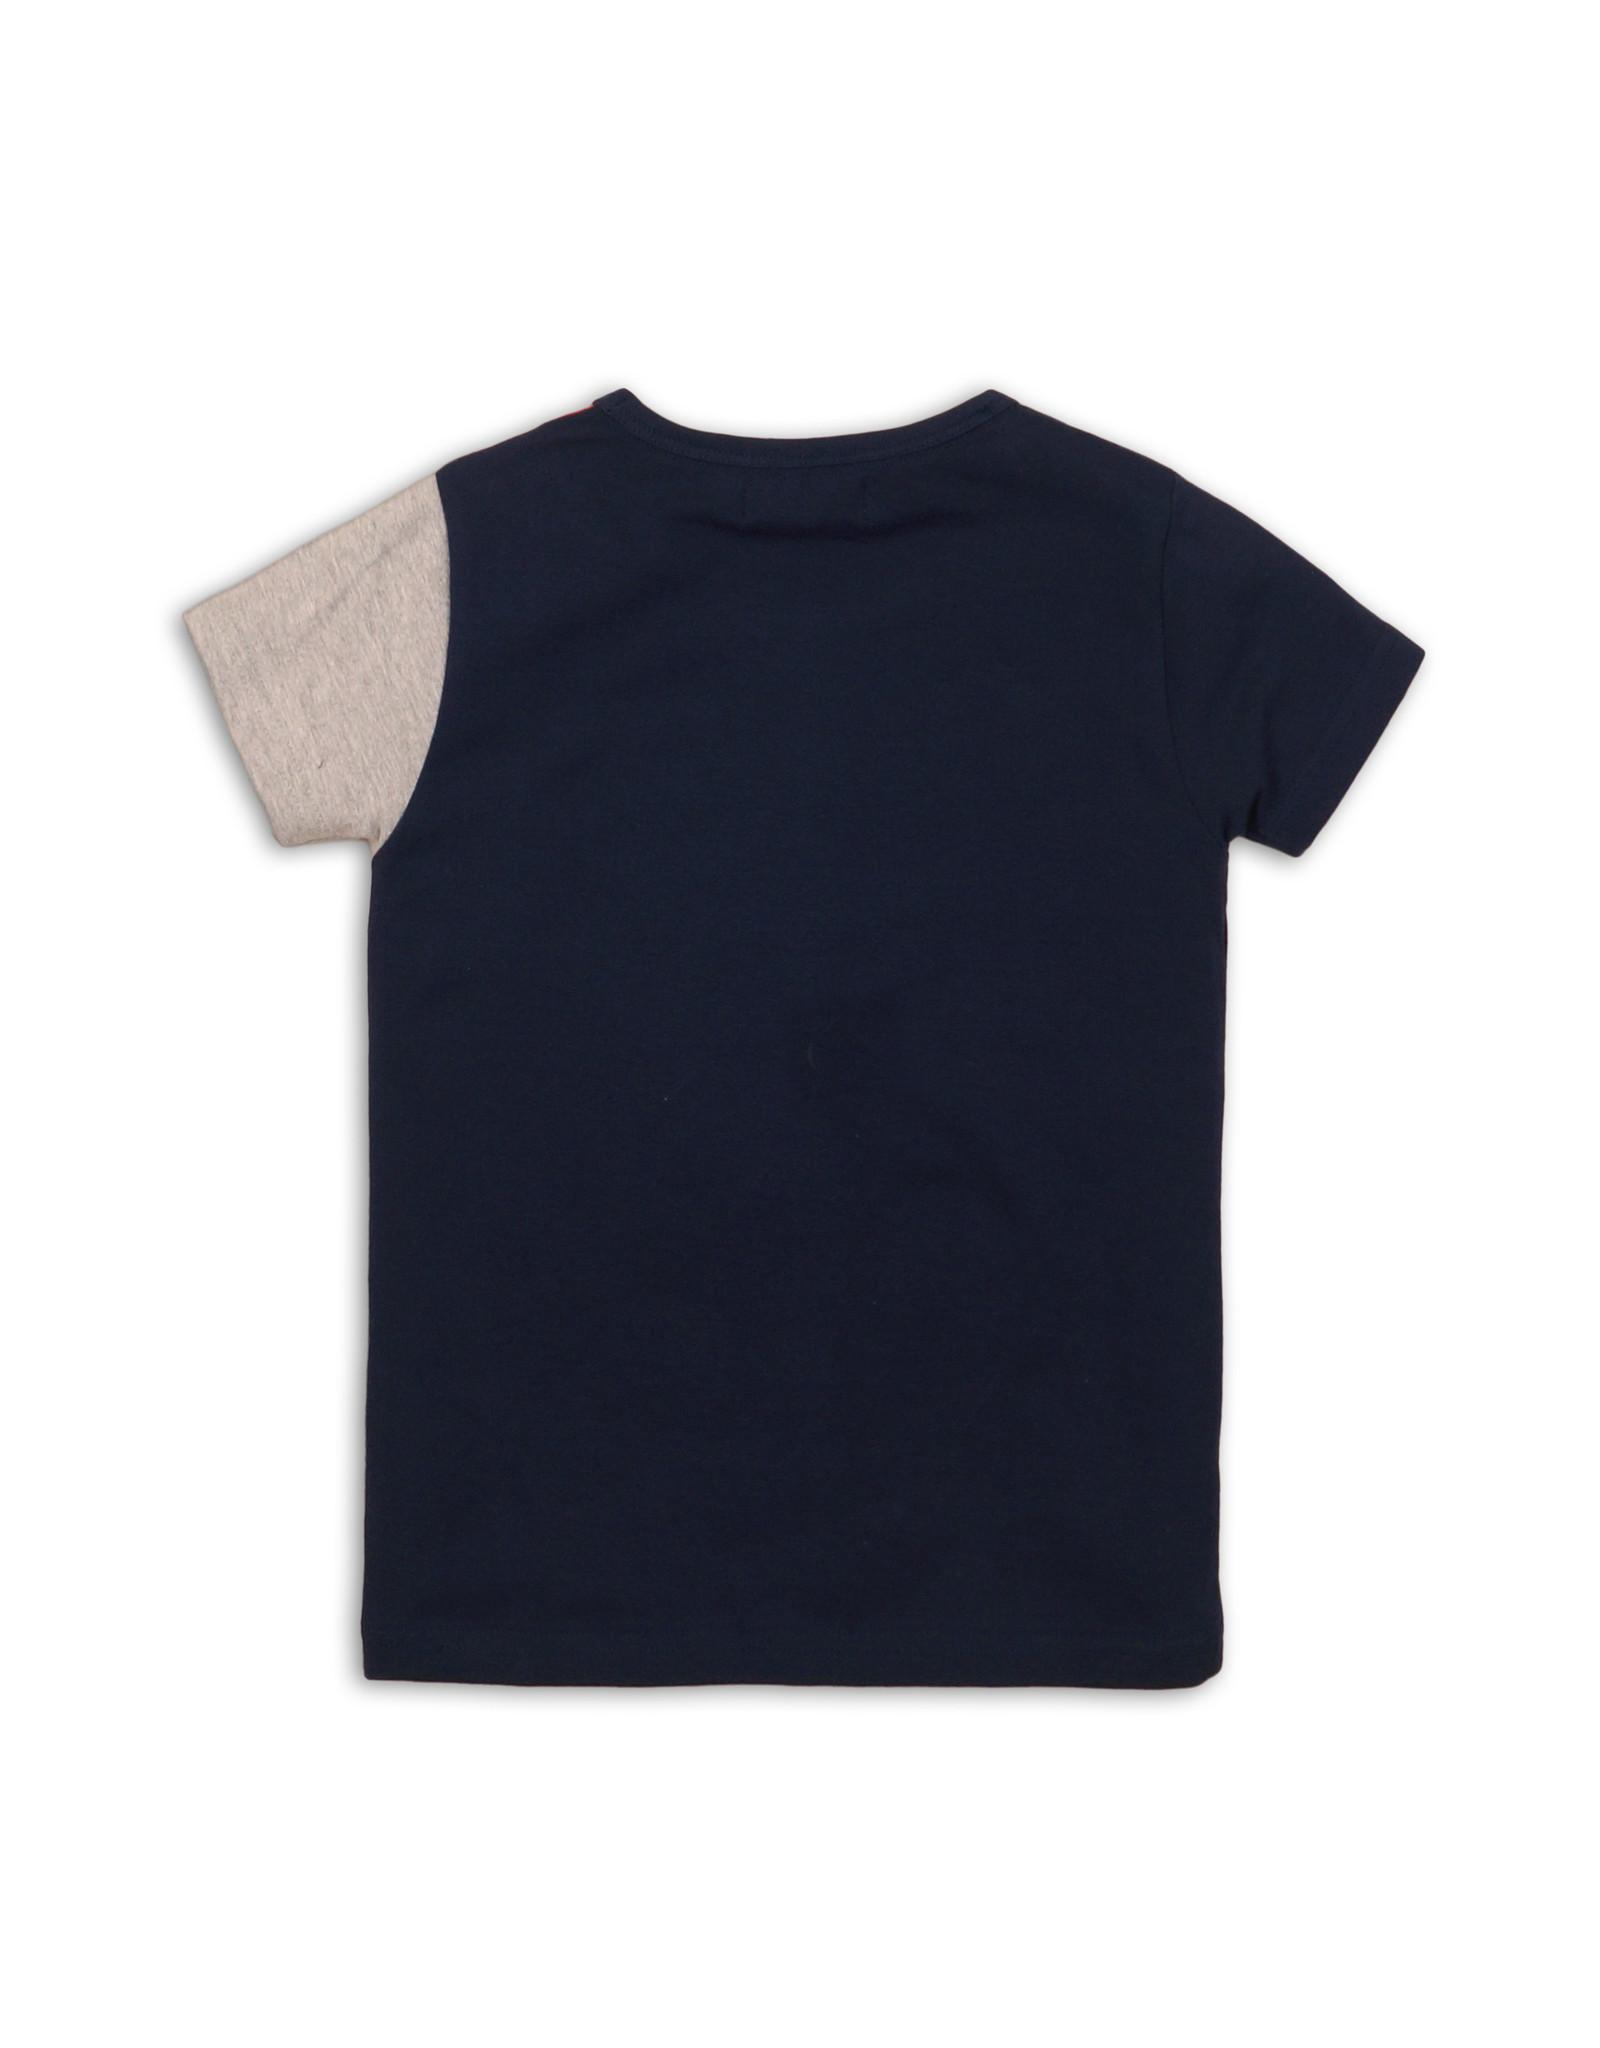 DJ Dutchjeans DJ Dutchjeans meisjes t-shirt met sterrenbies Navy Pink